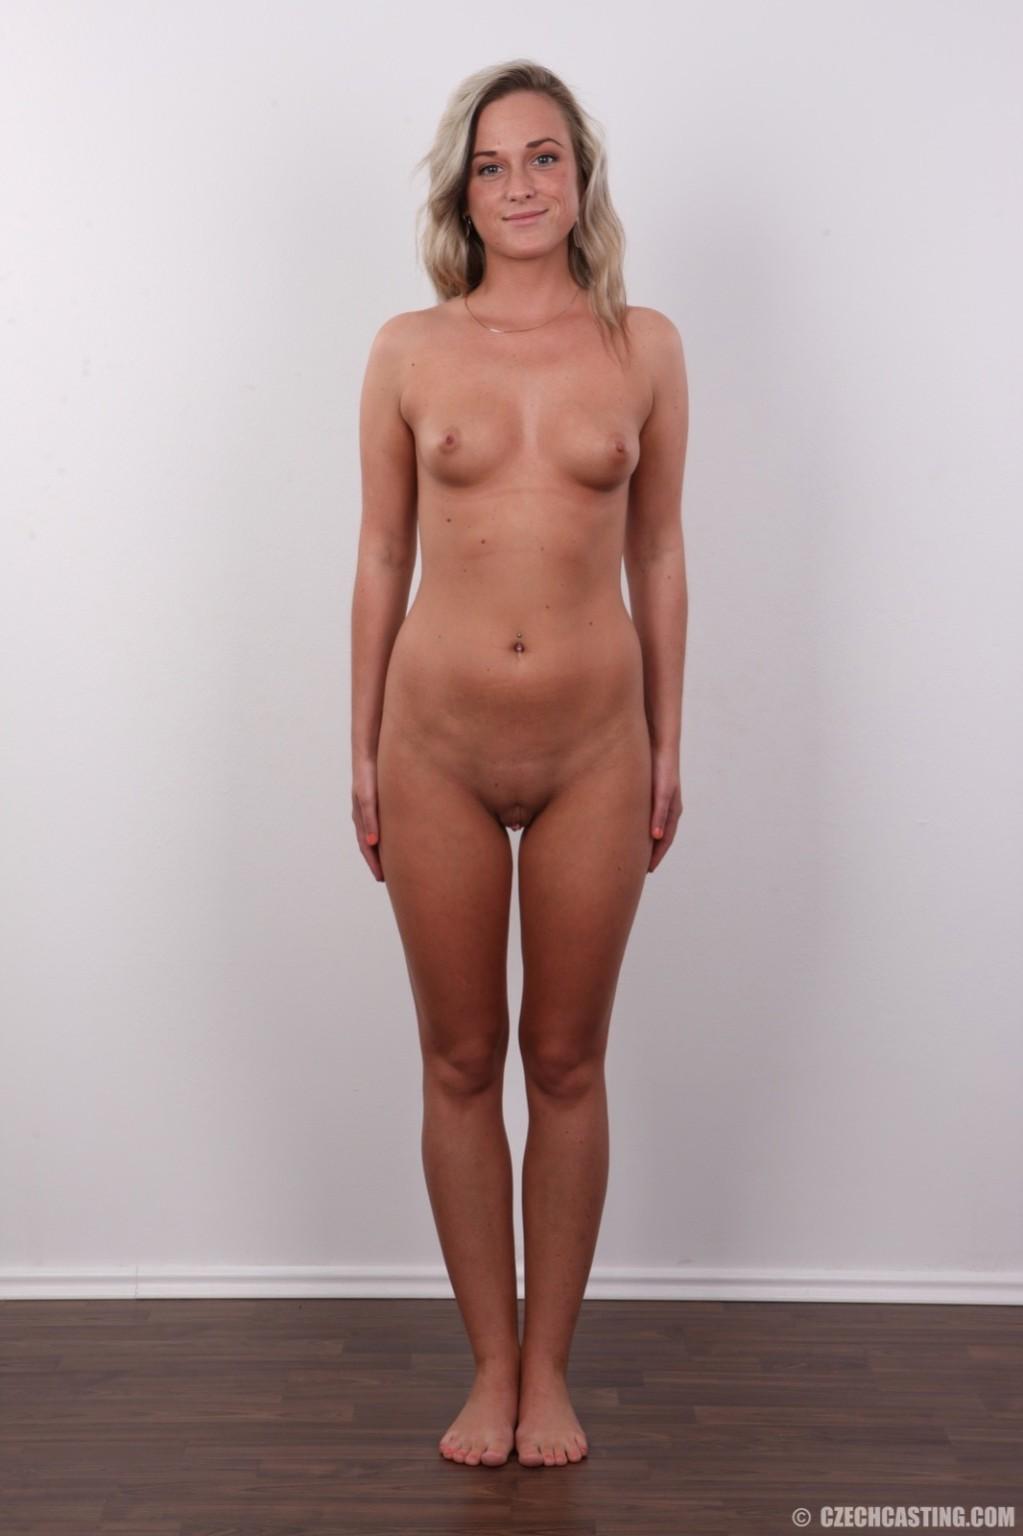 Pierced pussy wife pics